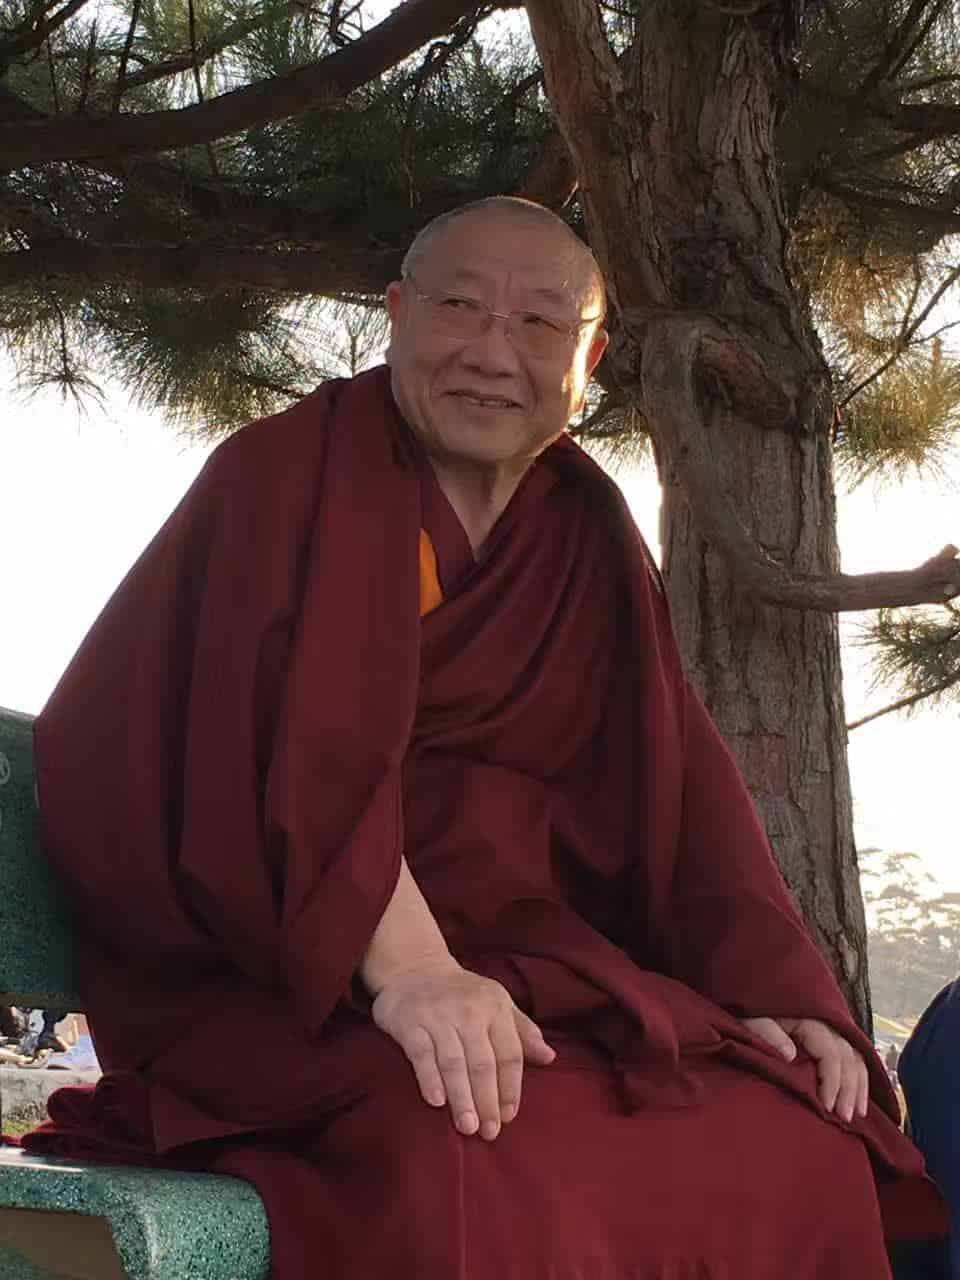 Gosok Rinpoche Vietnam 2017-03-07 65bfb8d729115b5e9186d6f8c5991c2